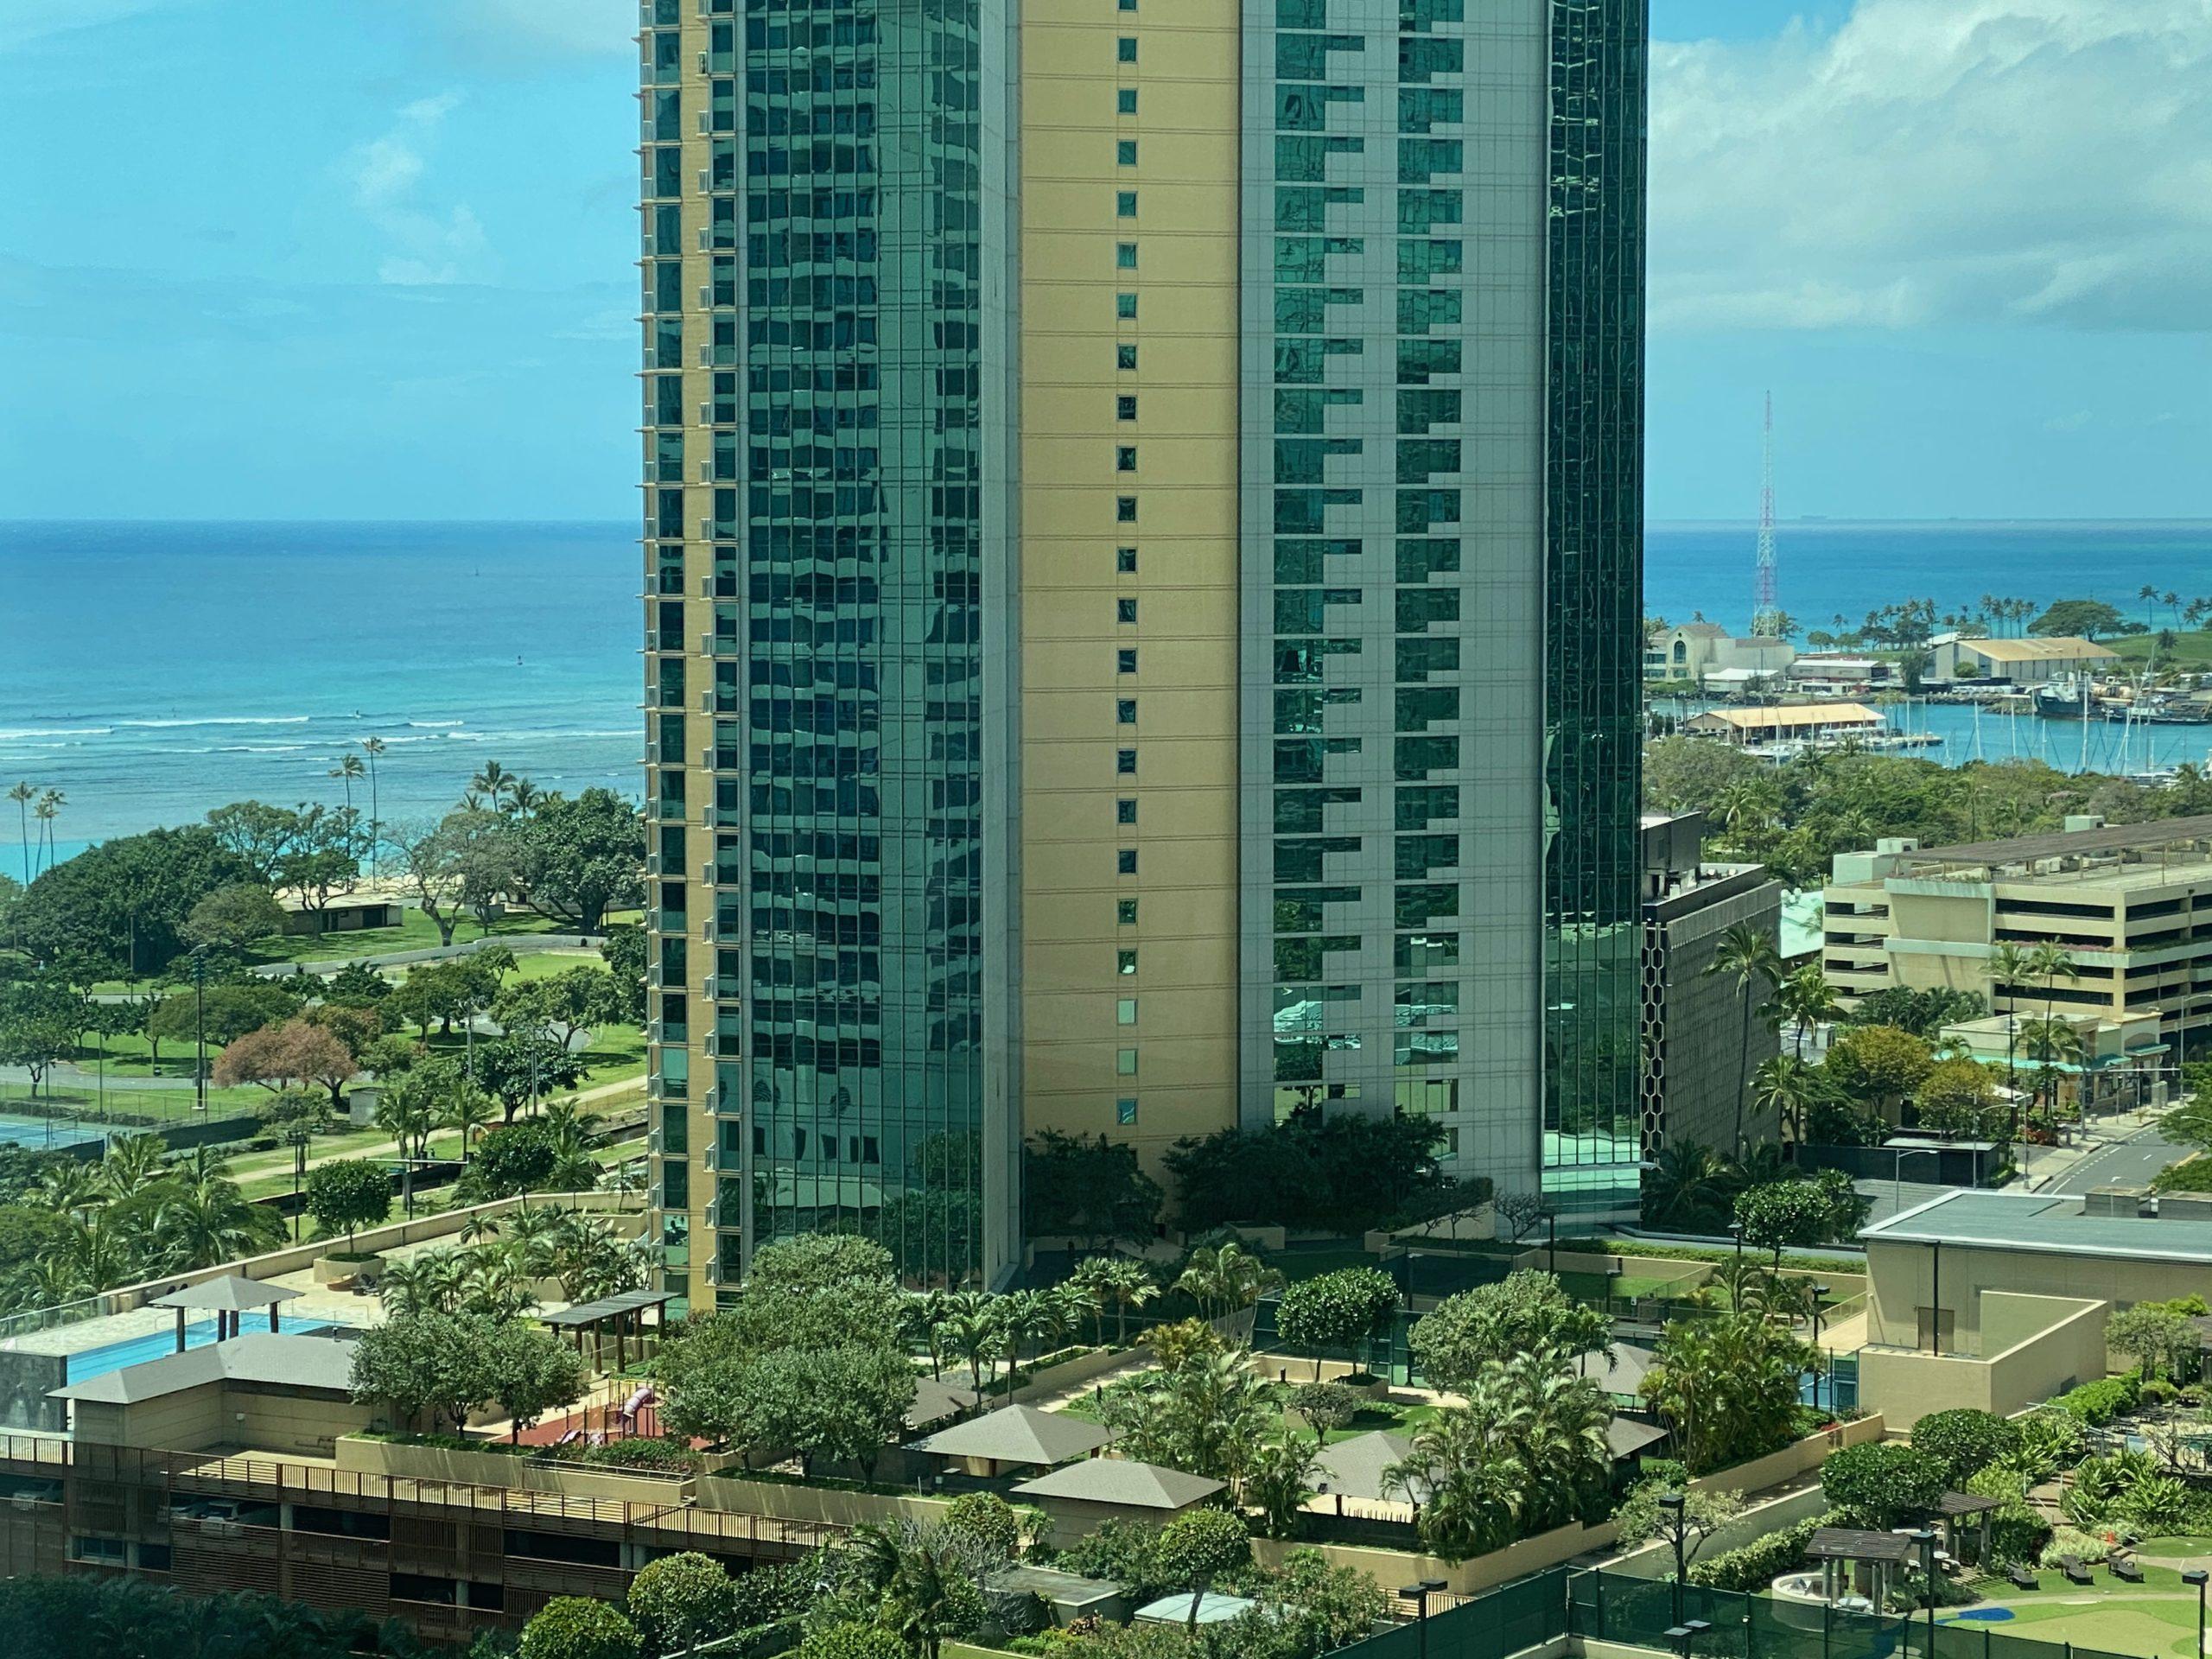 Hawaii Vacation Packages during Coronavirus